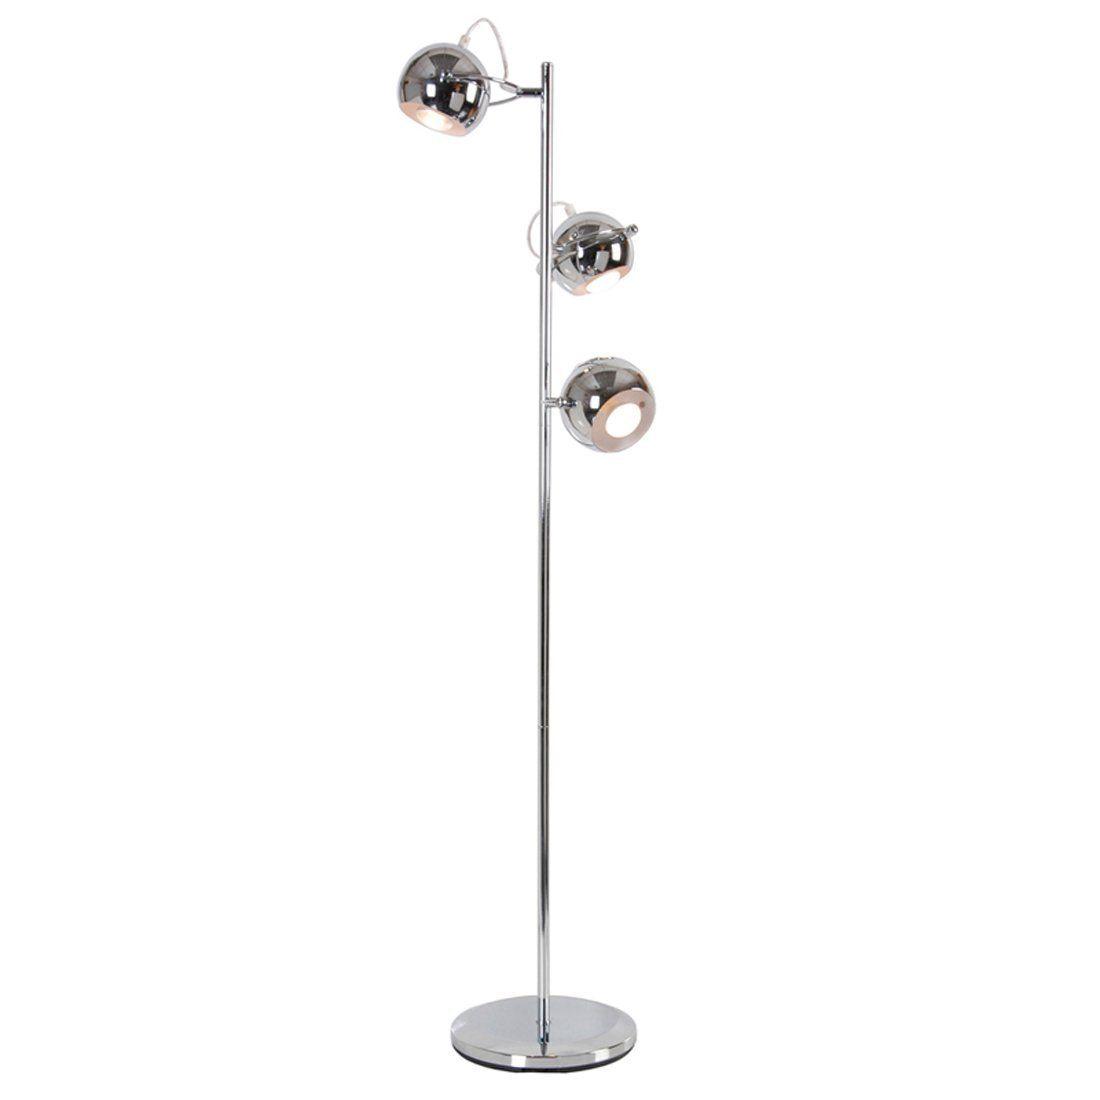 chrome retro designer 3 way adjustable eyeball floor lamp amazoncouk